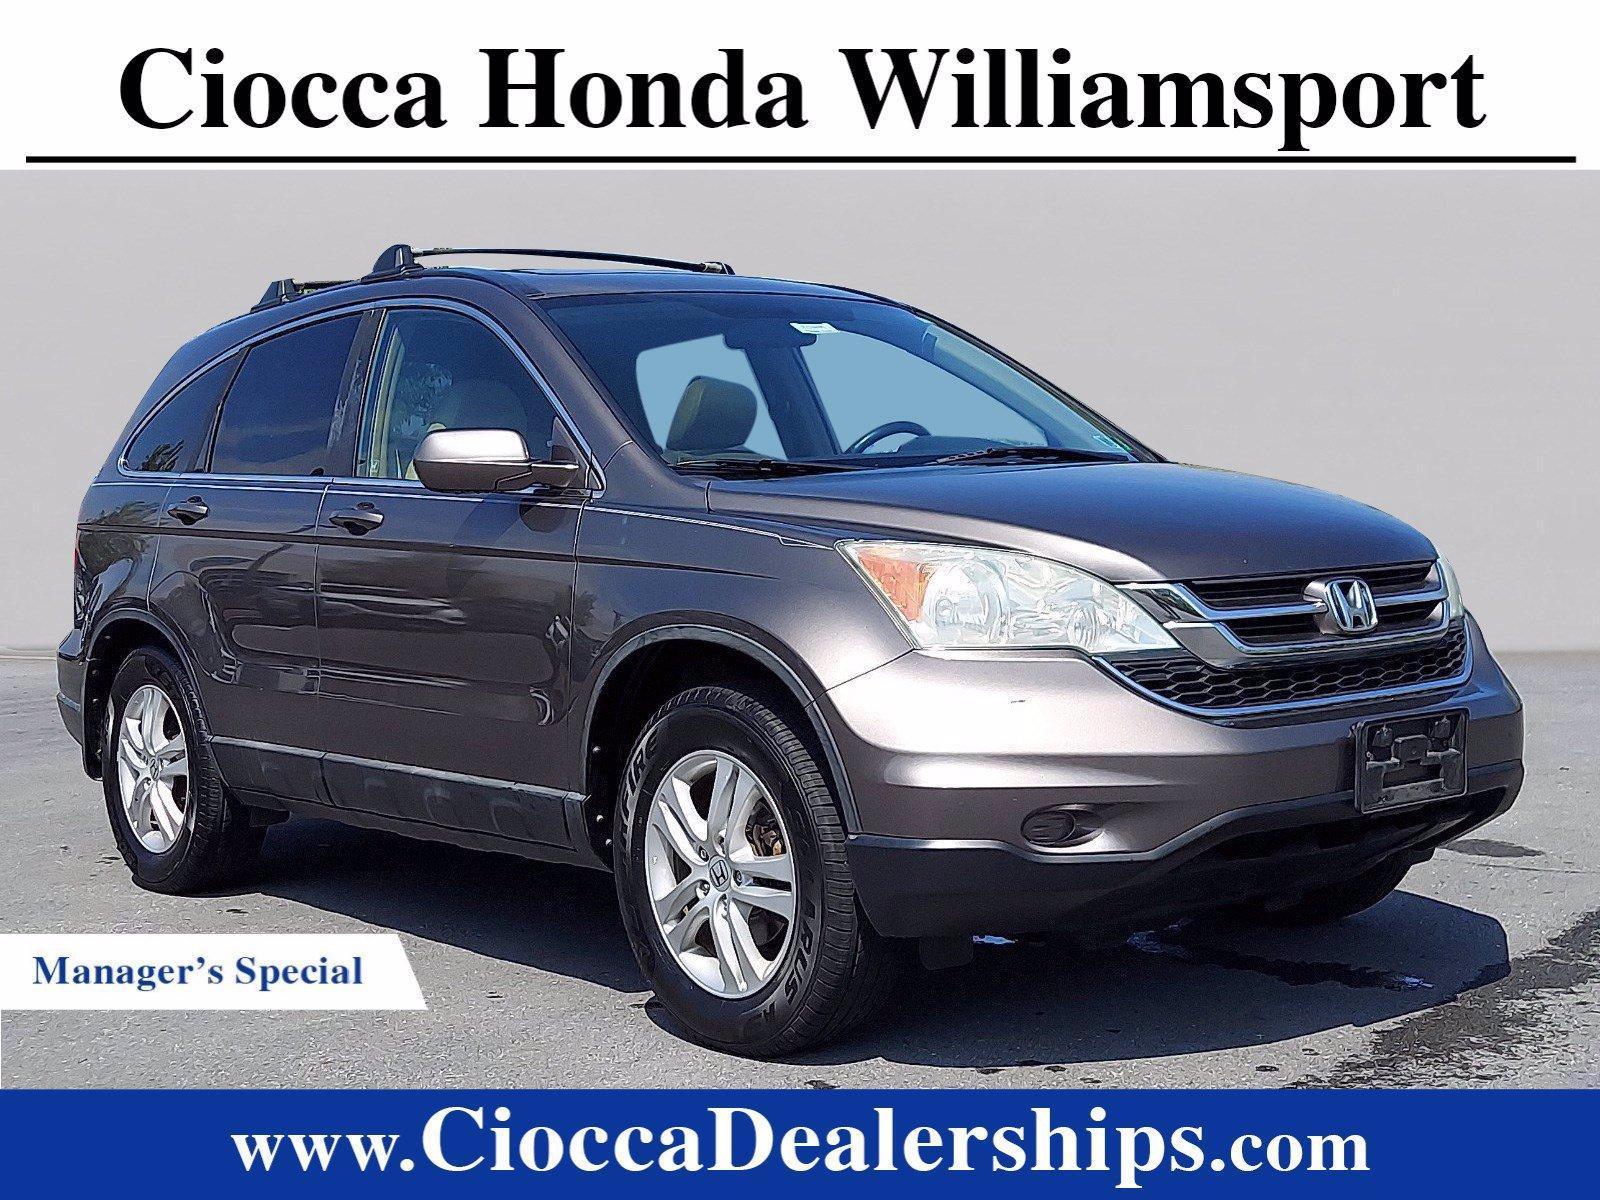 2010 Honda CR-V Vehicle Photo in Muncy, PA 17756